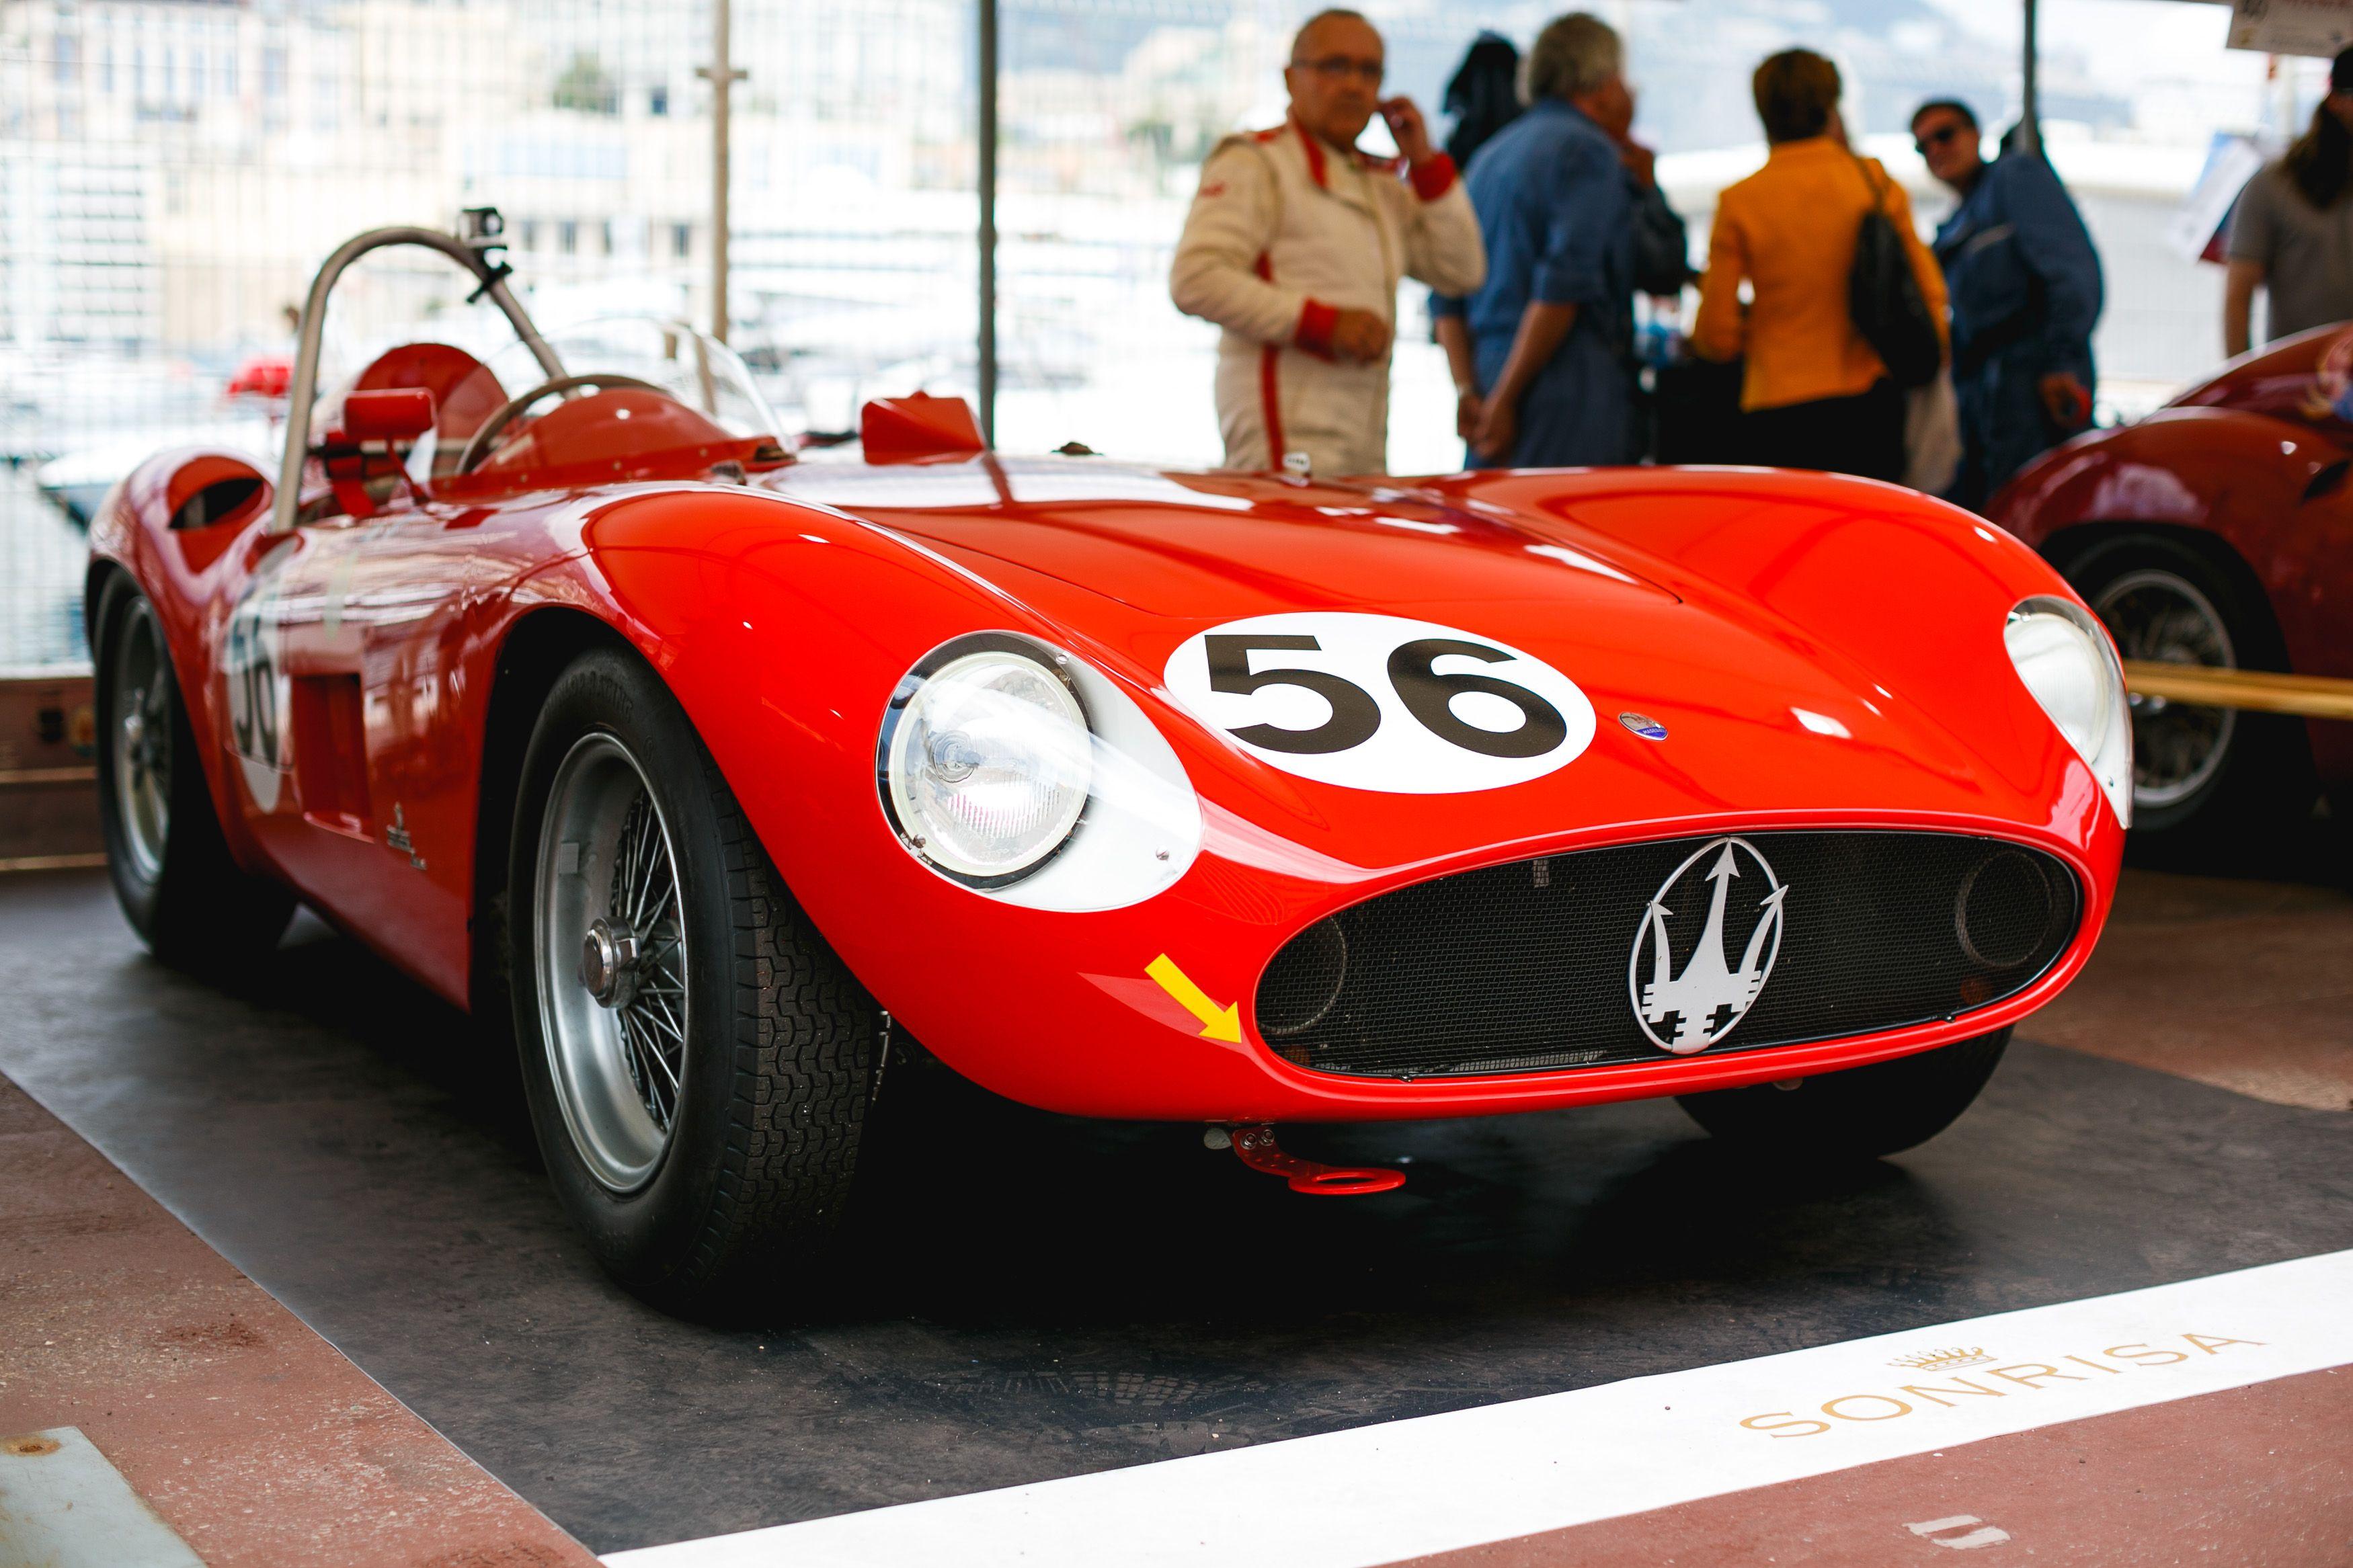 1561504_Grand_Prix_Maserati_300S_2